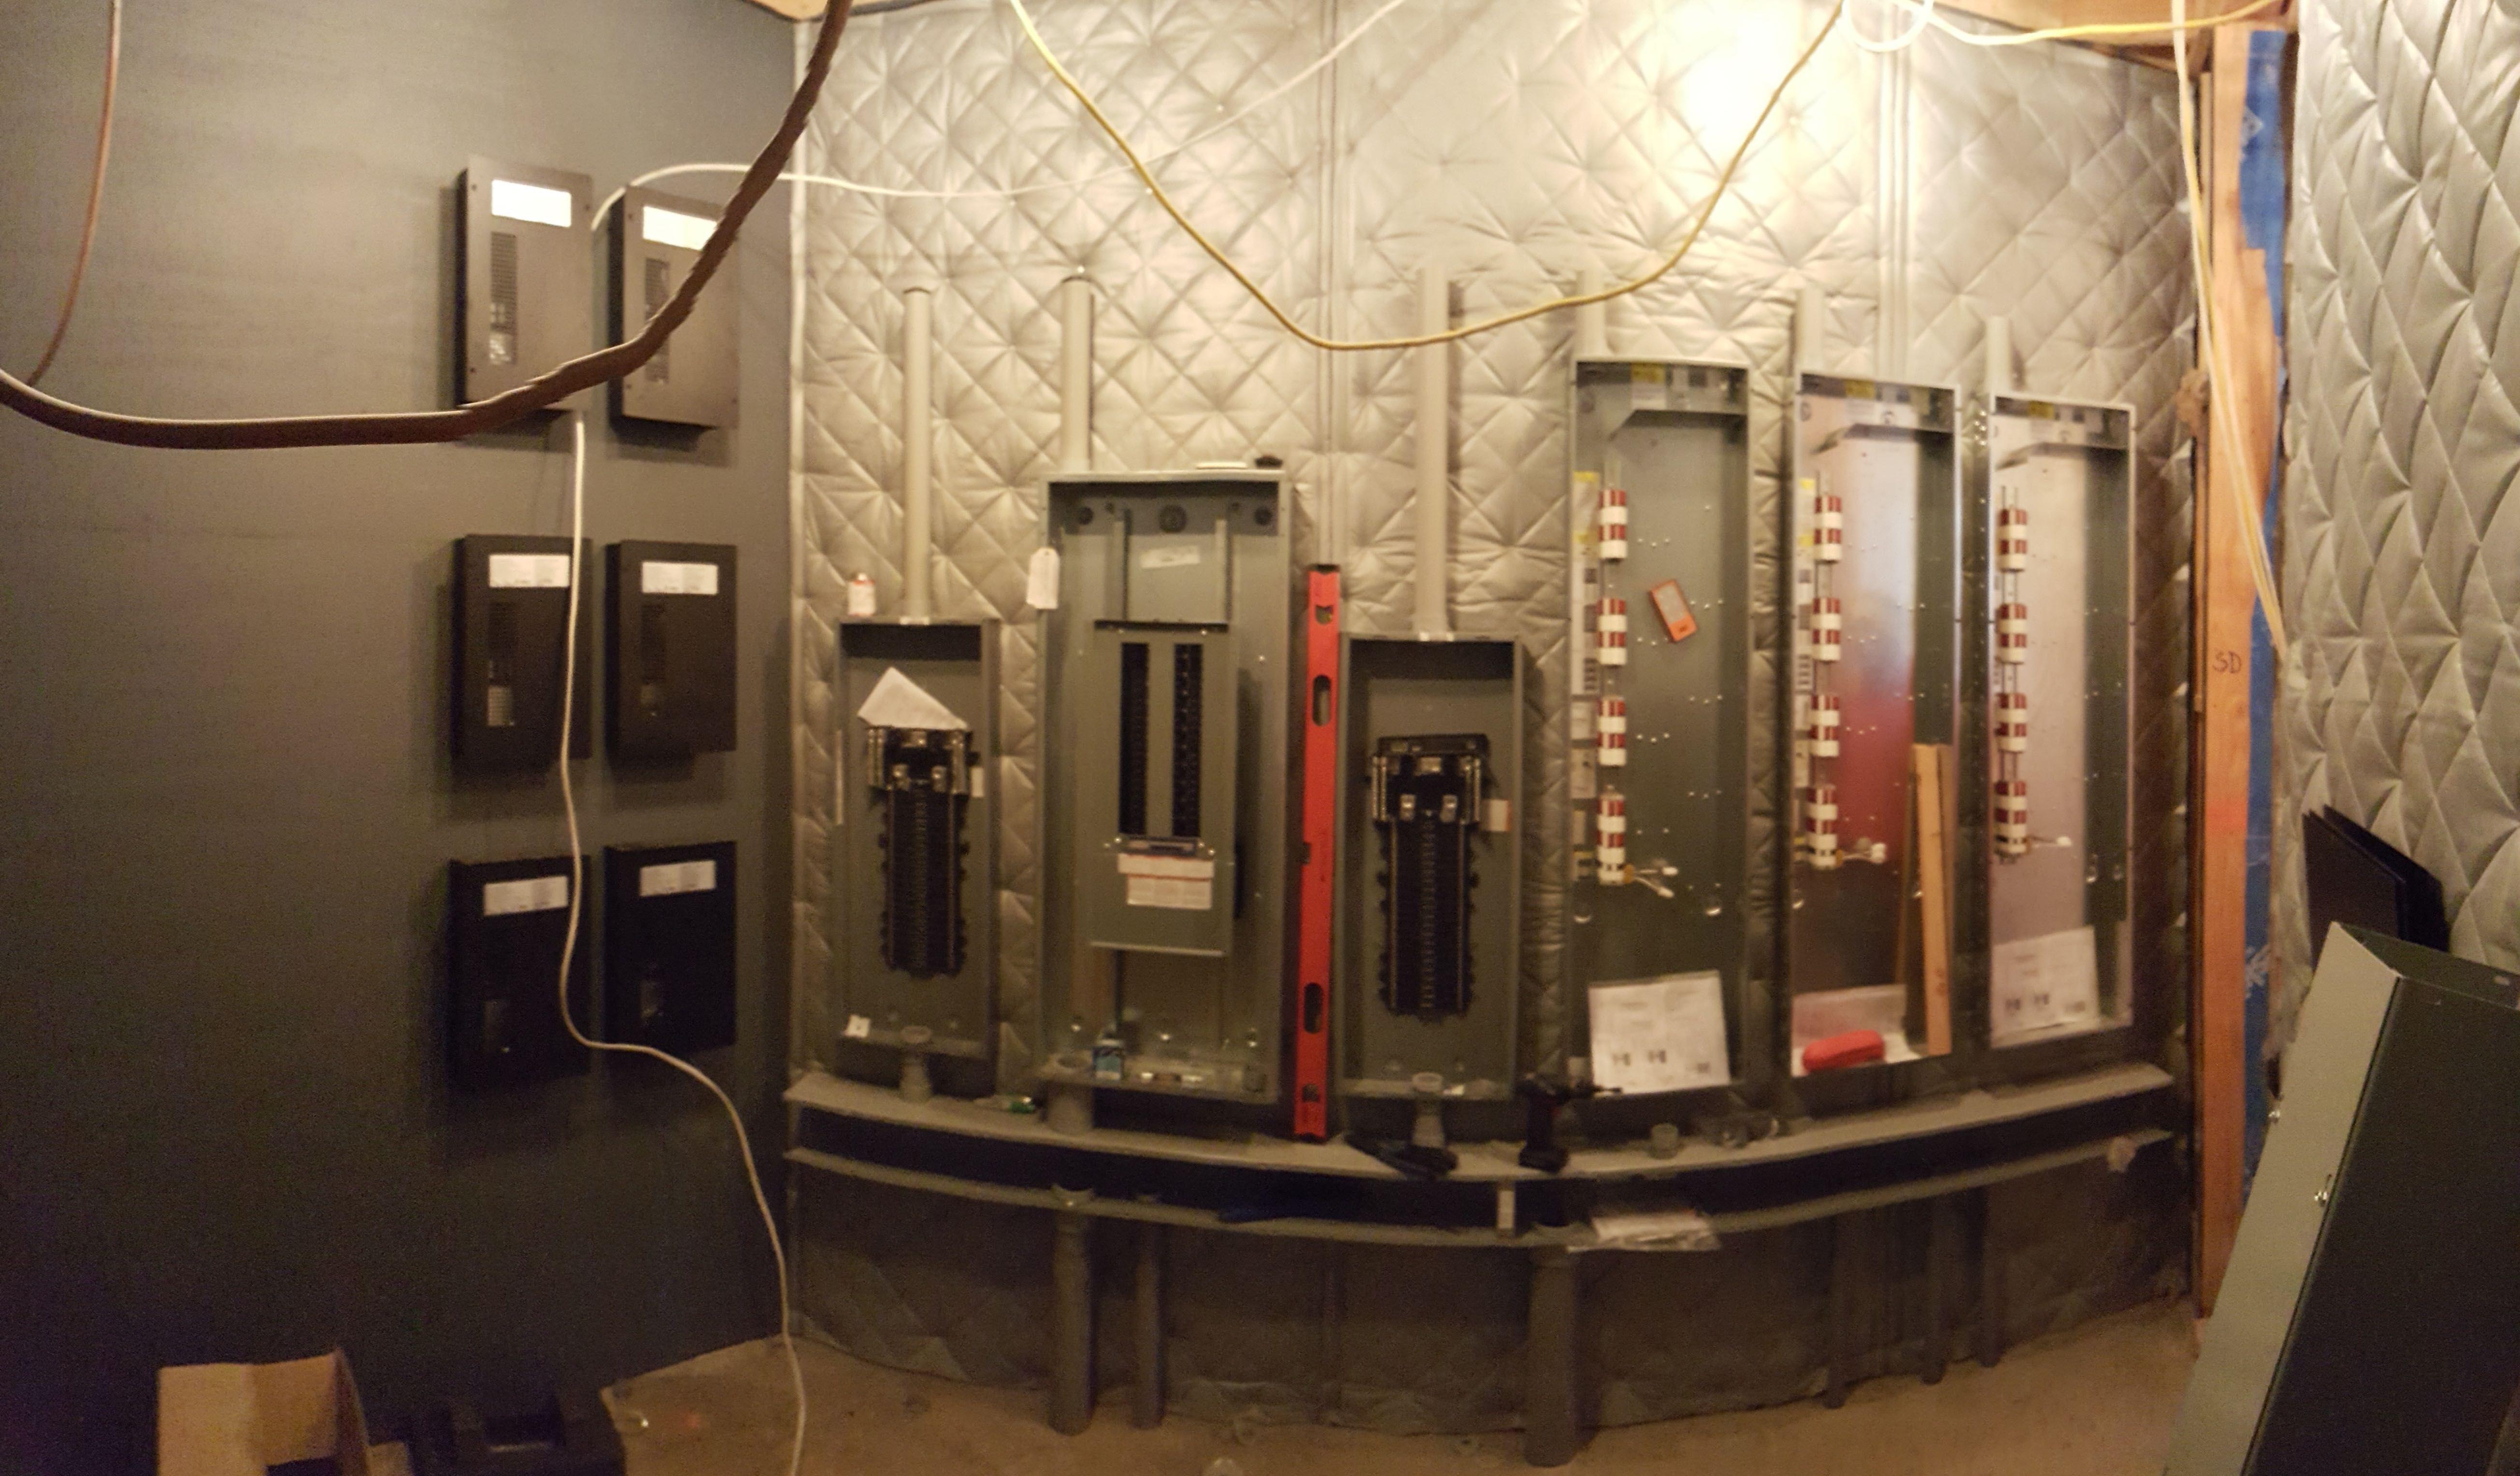 Siemens Sub Panel Wiring Diagram